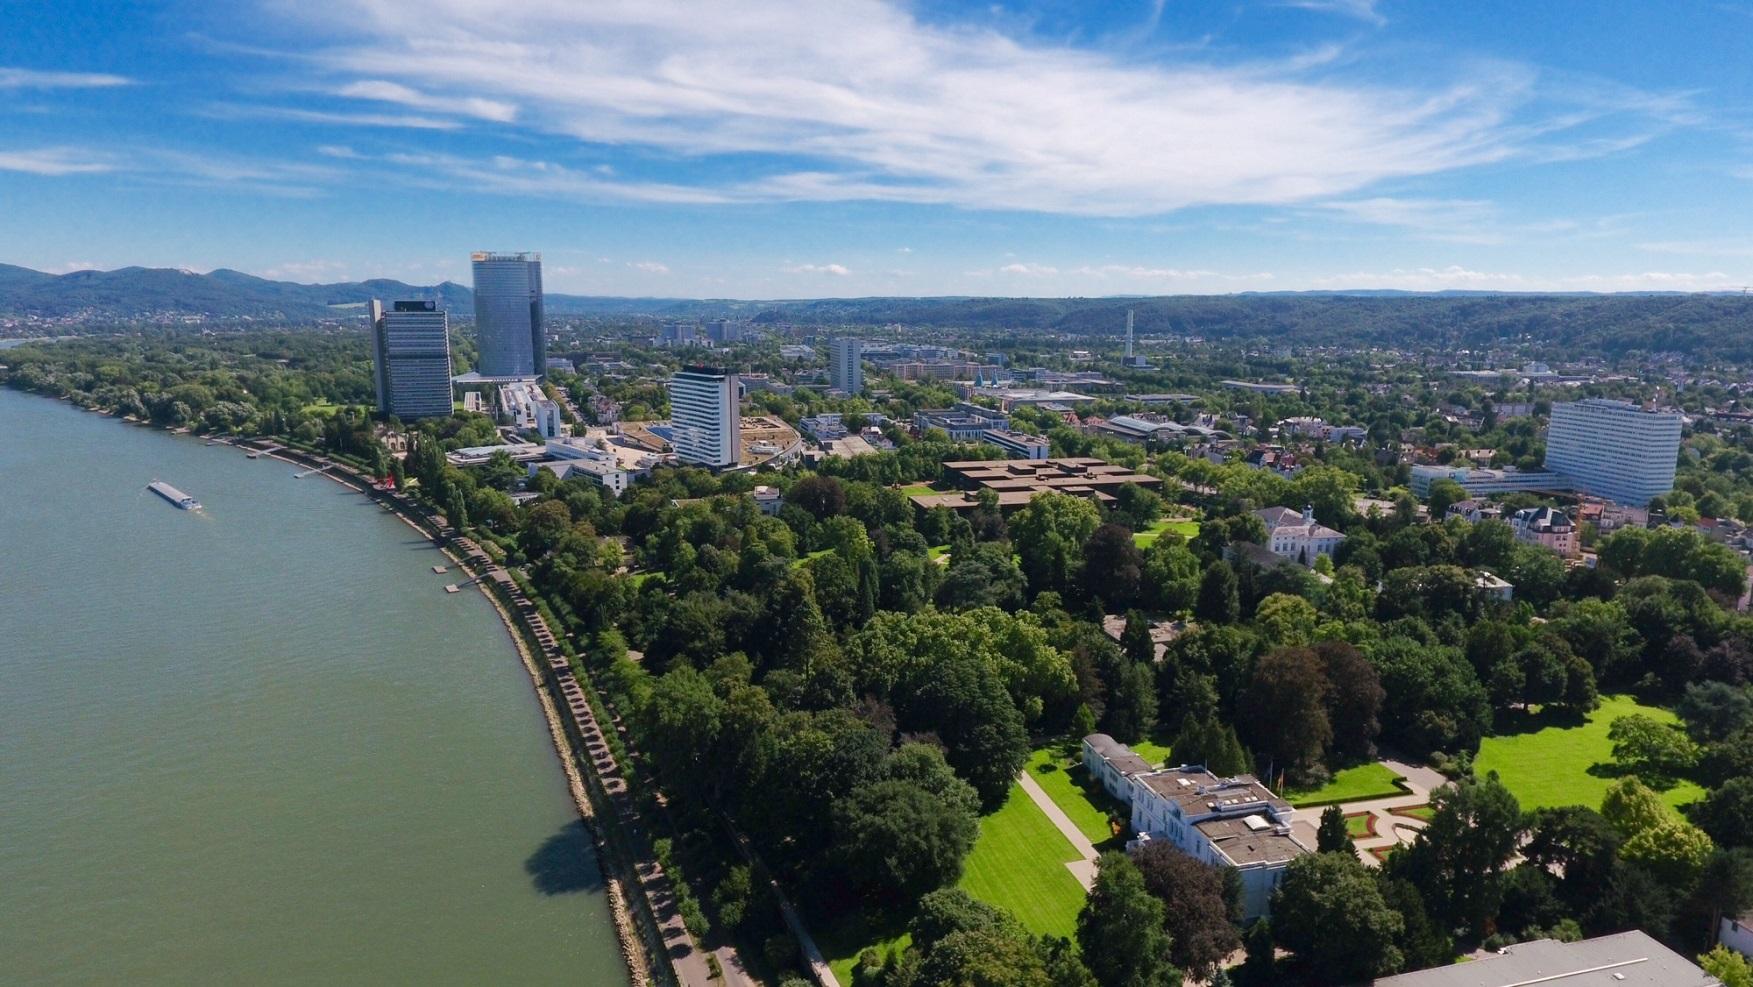 Bonn International Business District (BIBD)